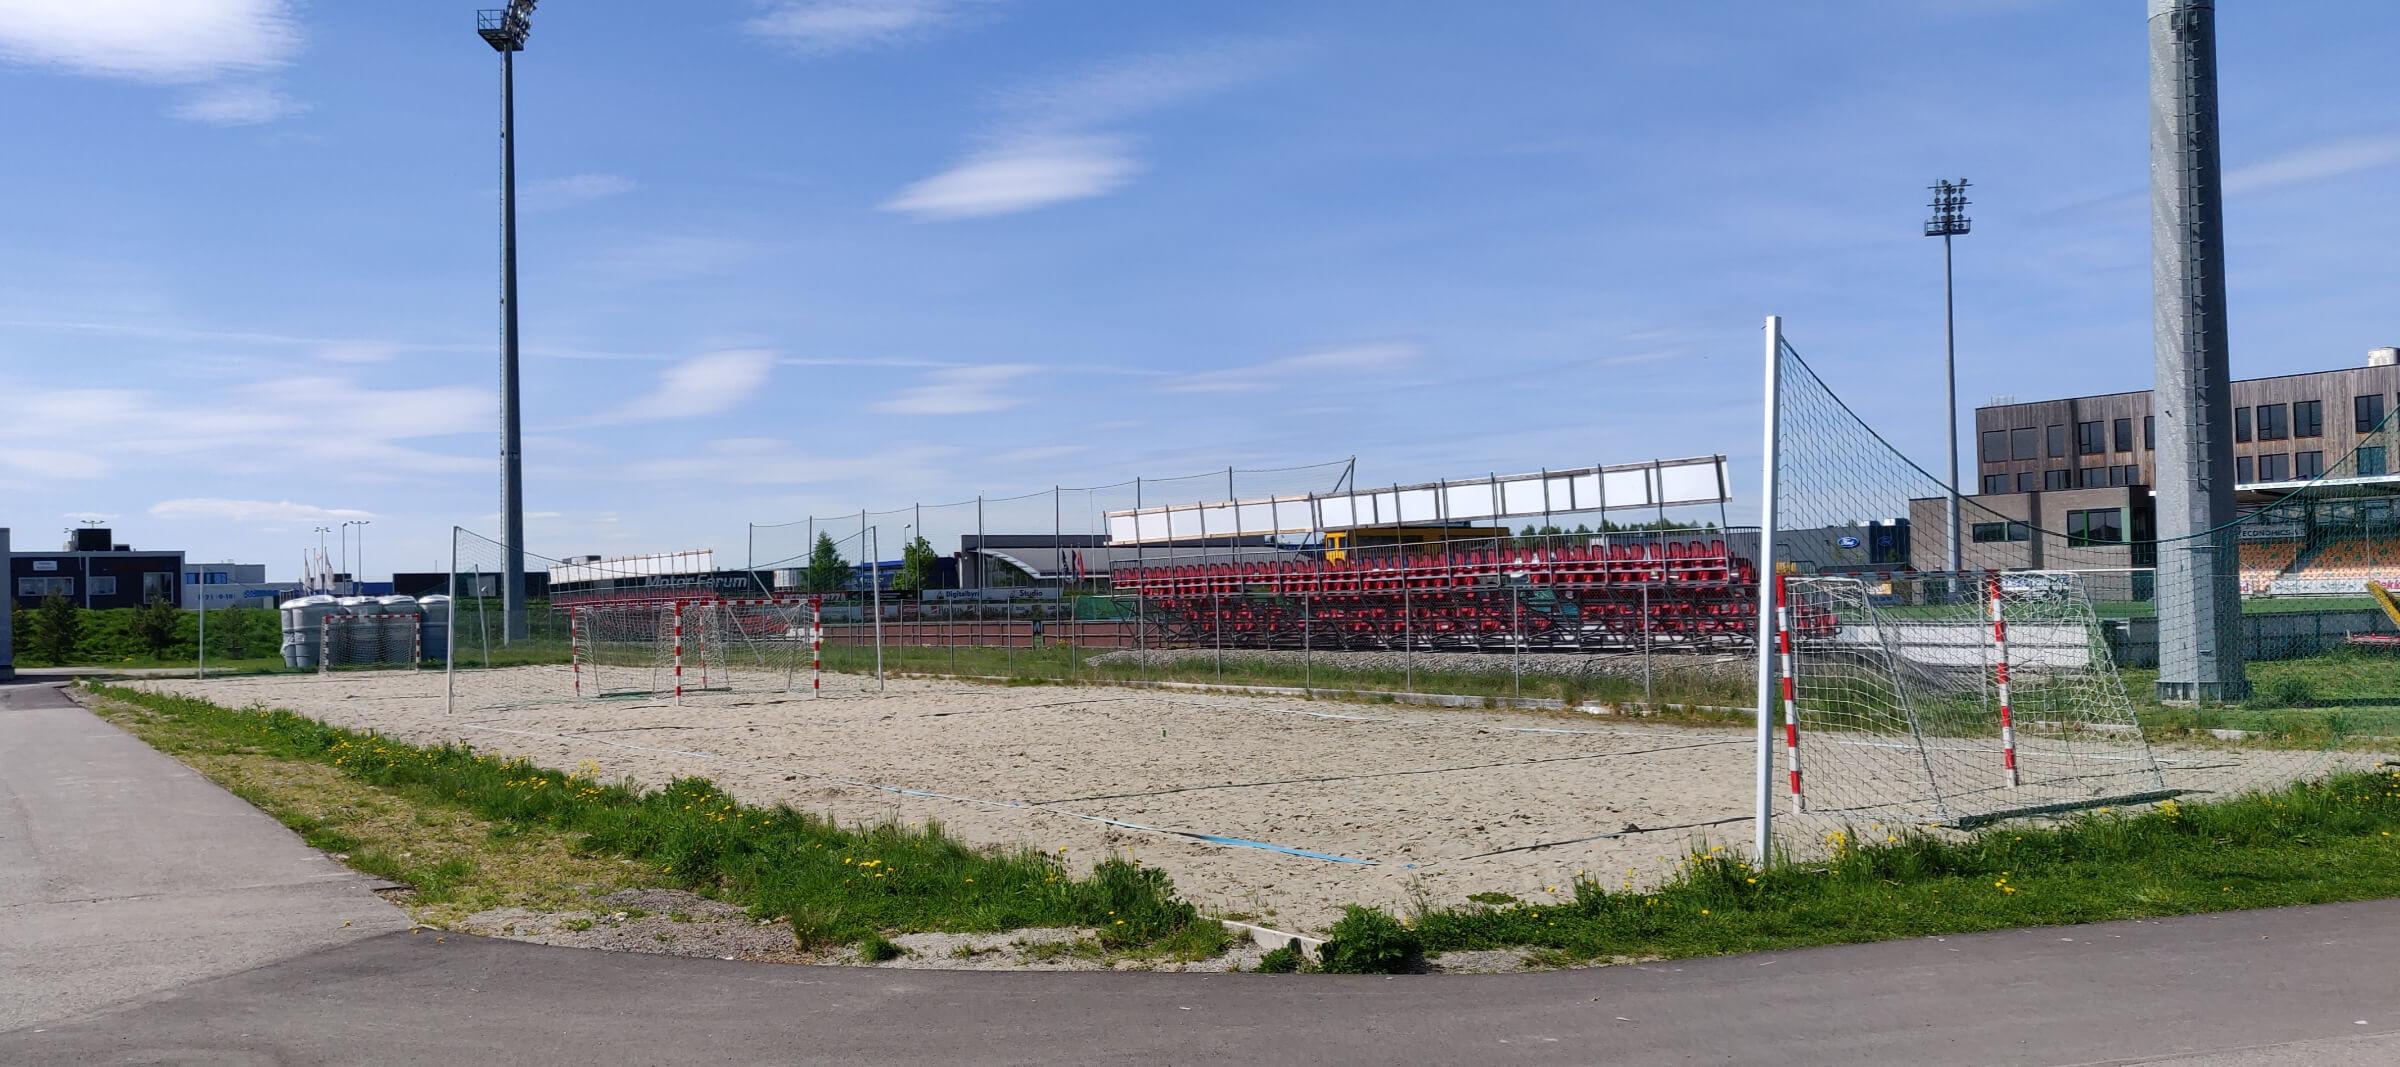 Strandhåndball bane